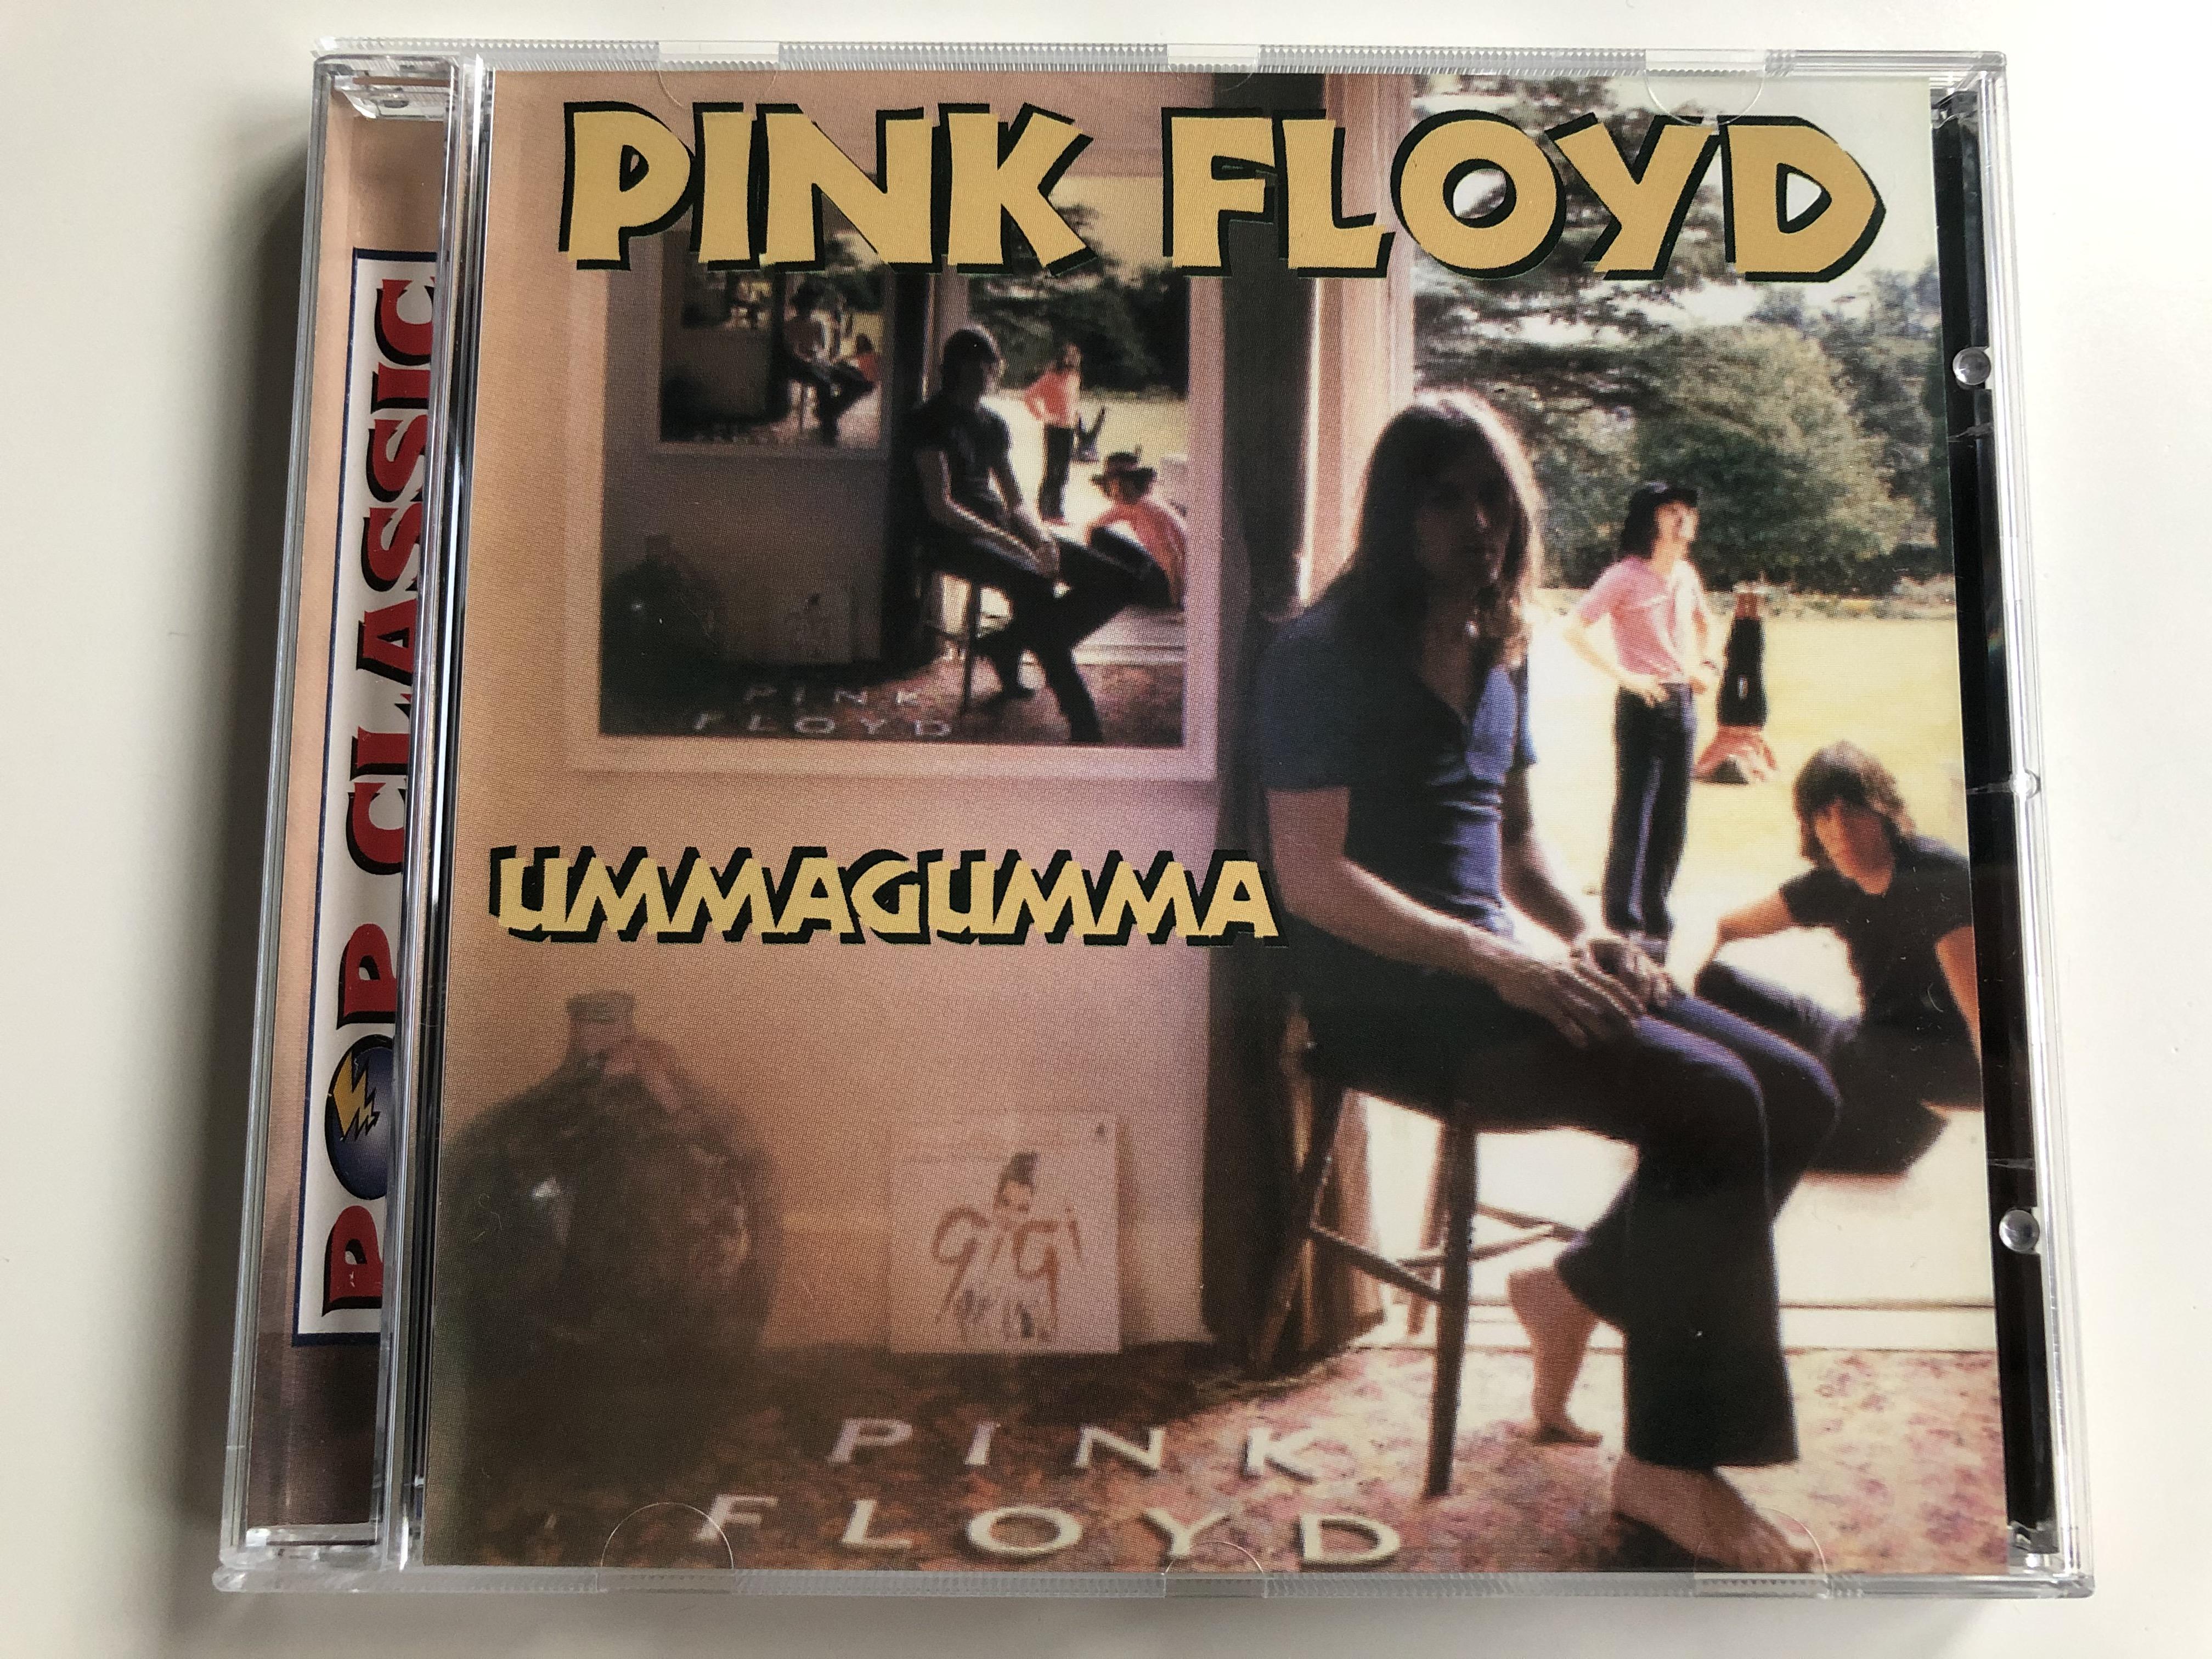 pink-floyd-ummagumma-pop-classic-euroton-audio-cd-eucd-0062-1-.jpg